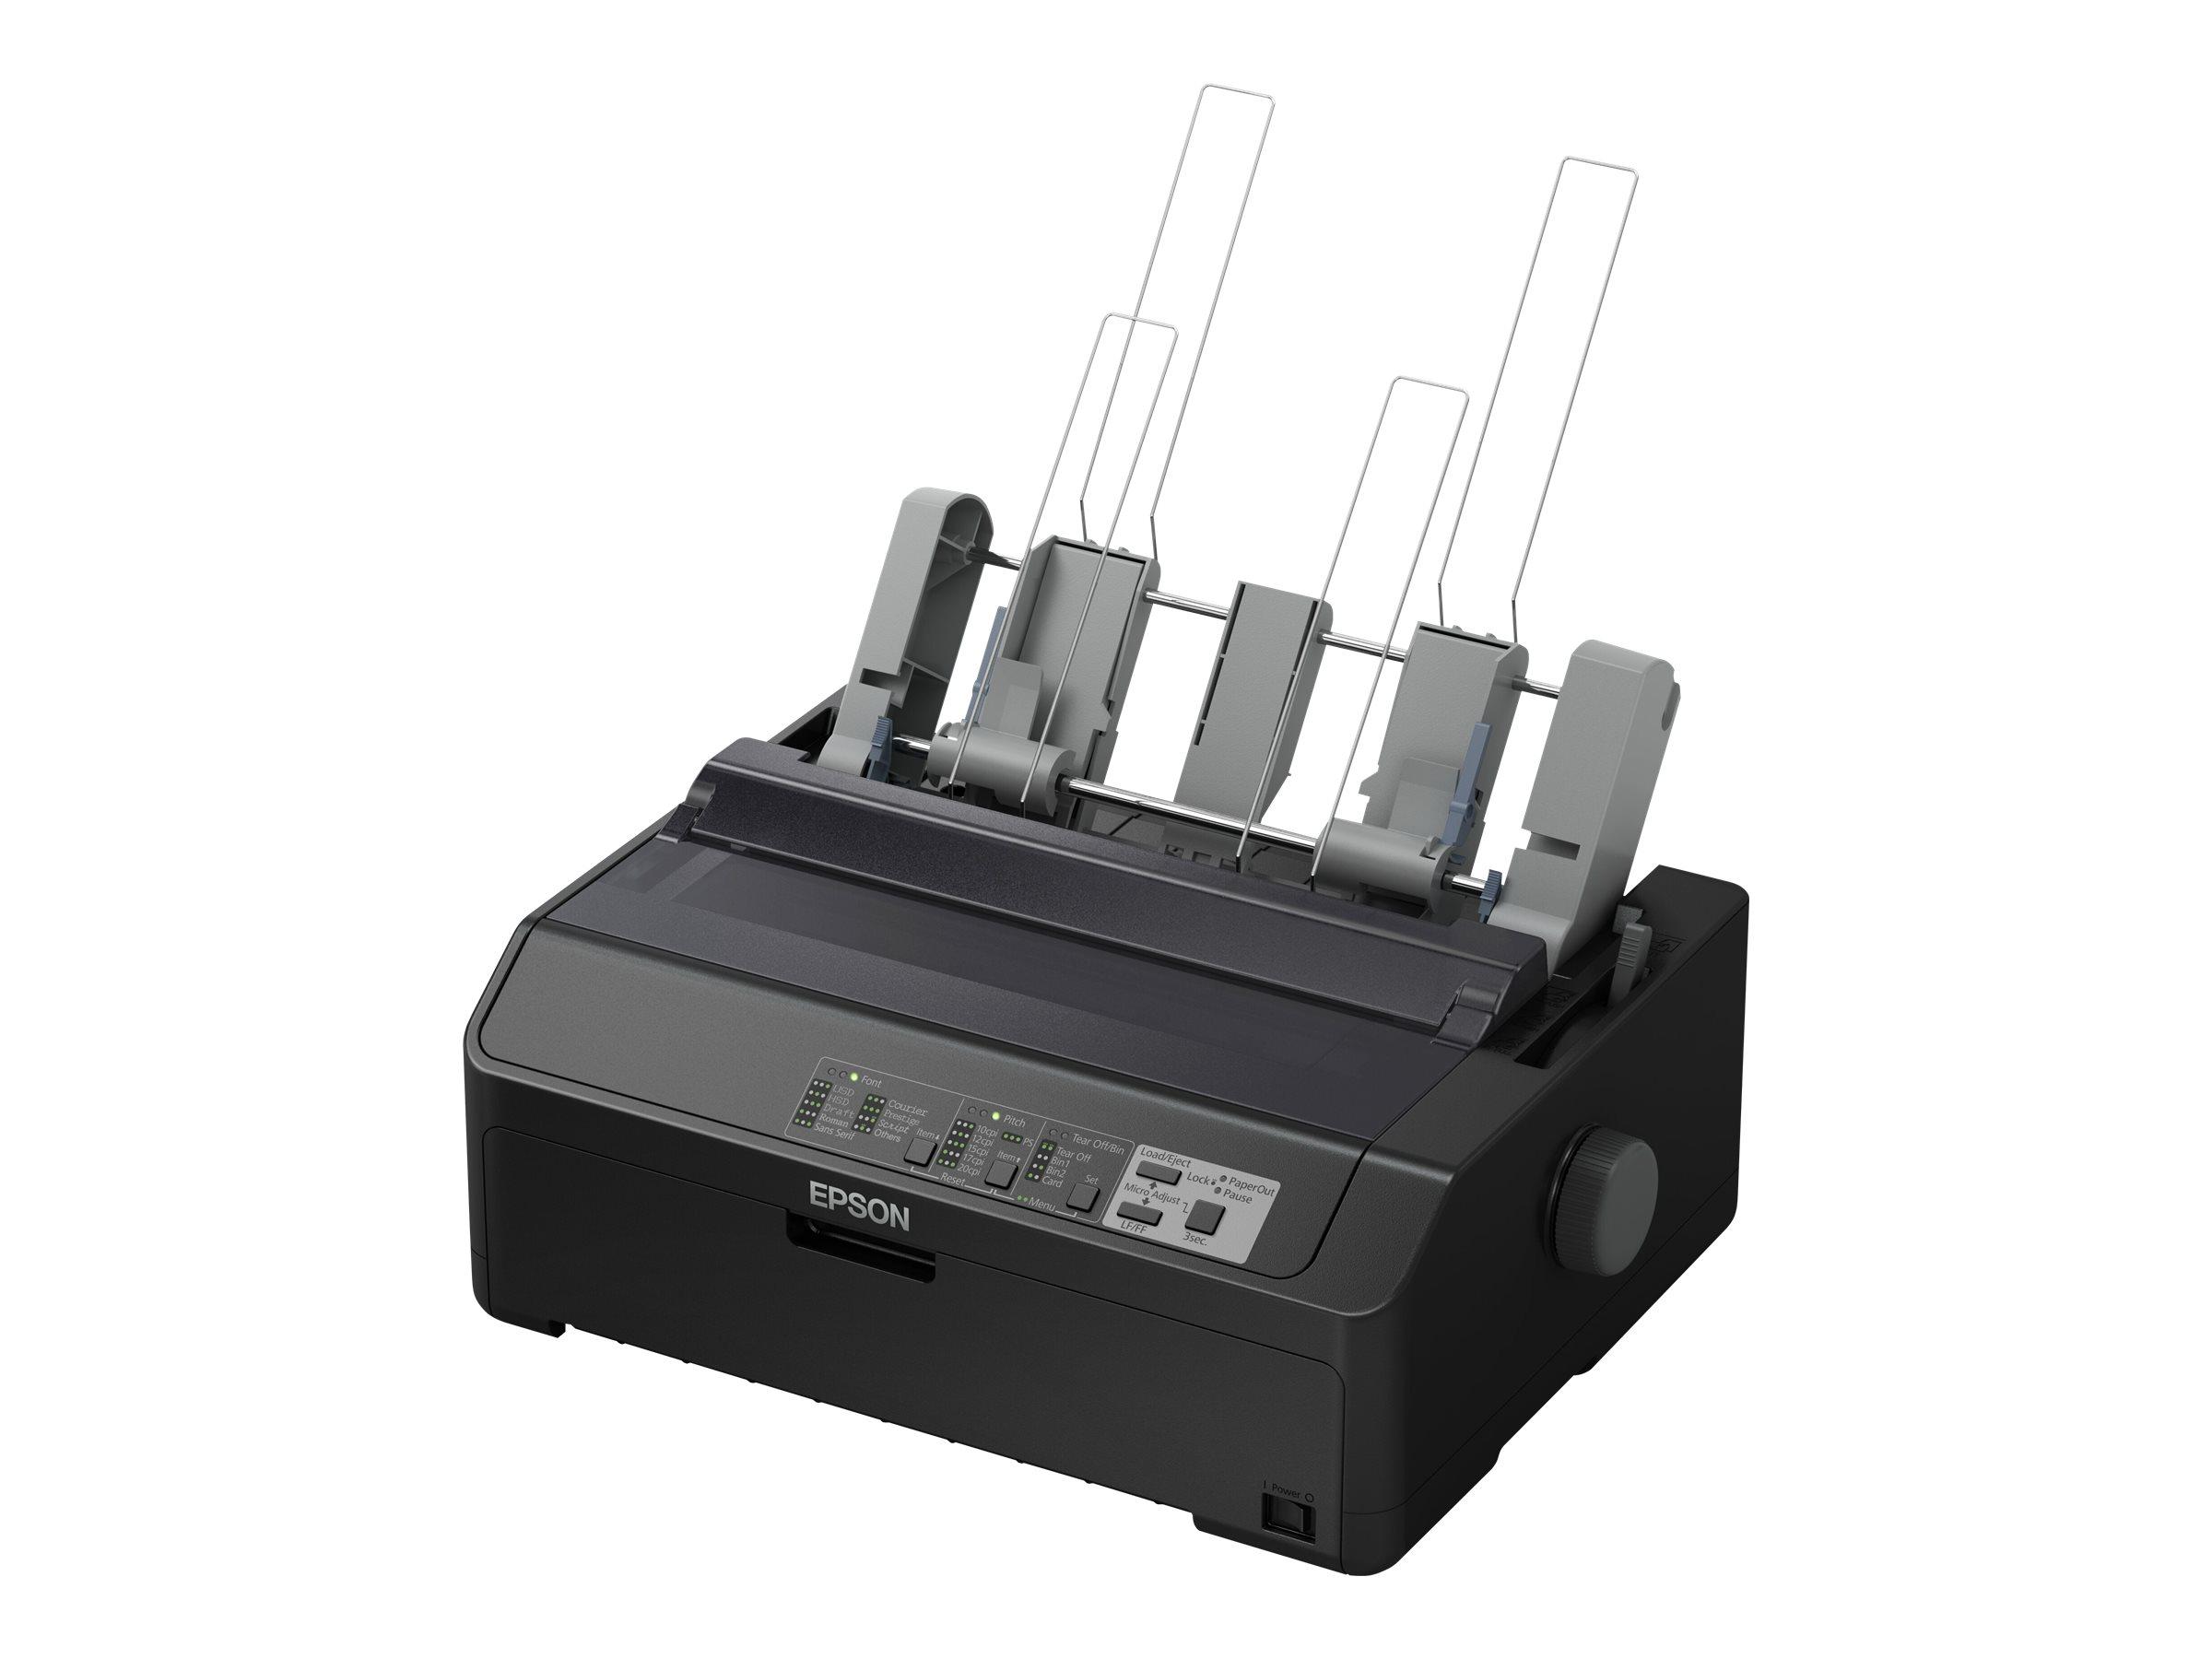 Epson LQ 590IIN - Drucker - monochrom - Punktmatrix - Rolle (21,6 cm), JIS B4, 254 mm (Breite) - 360 x 180 dpi